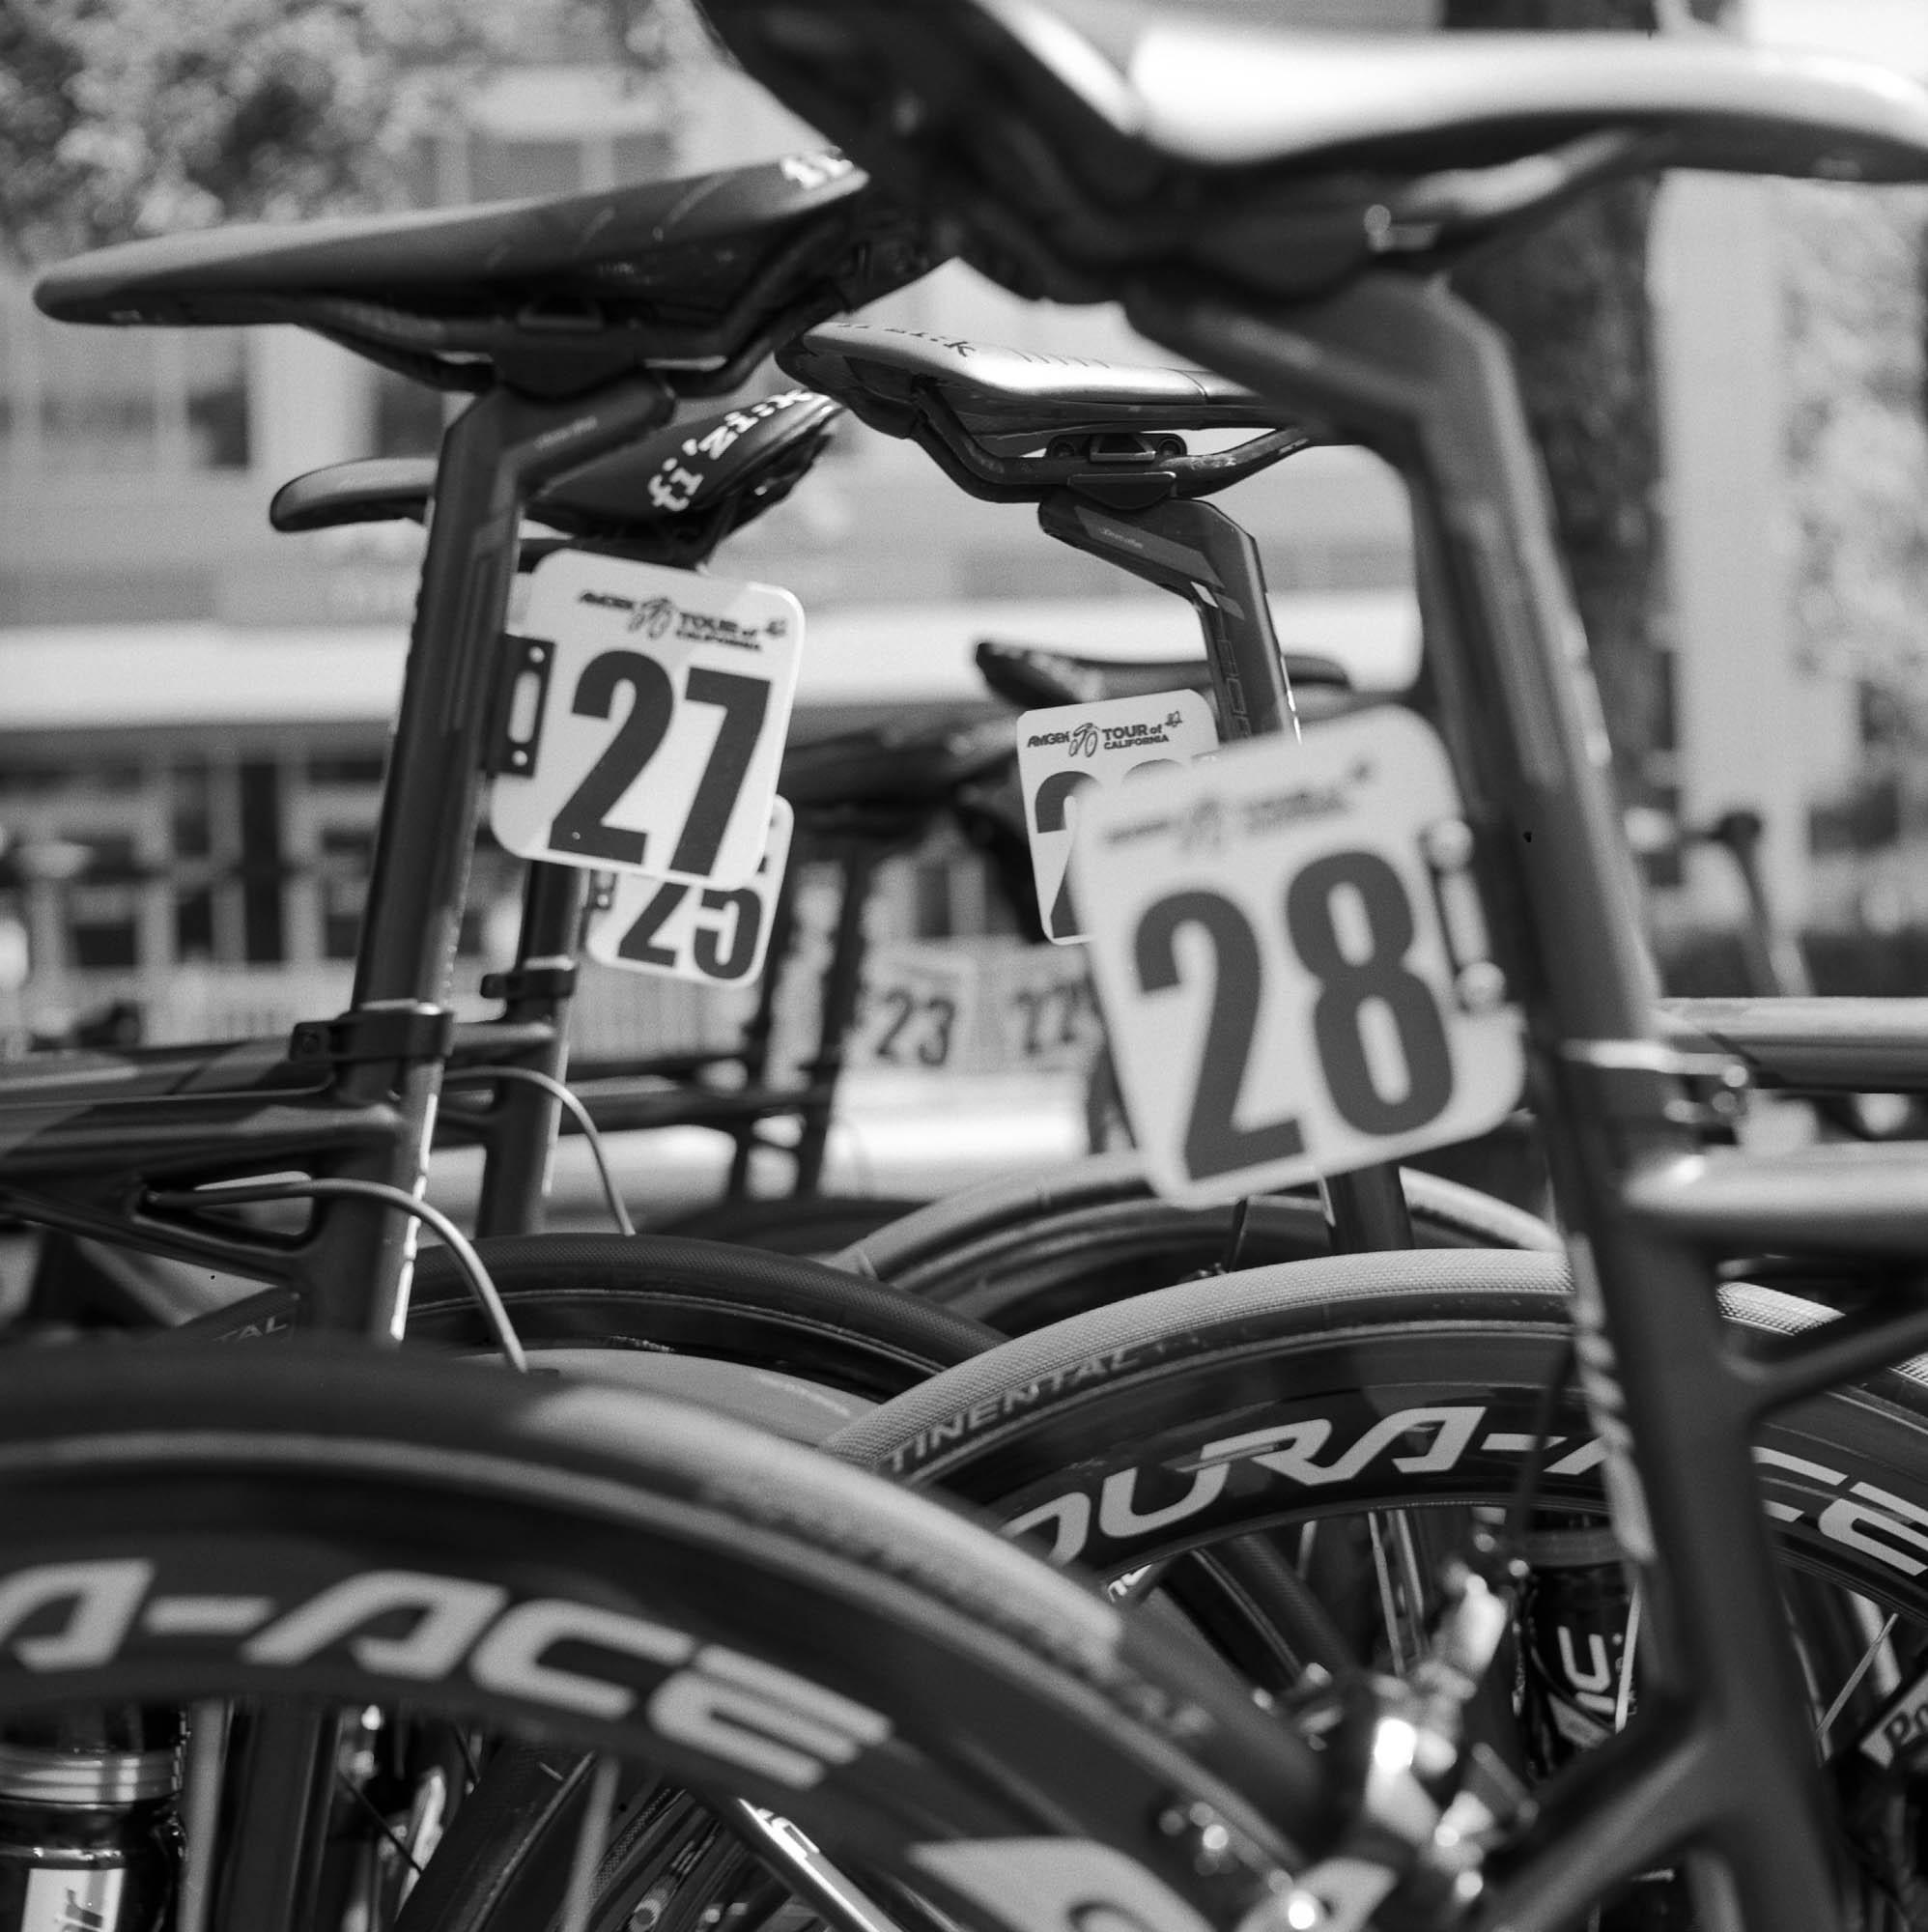 Gabi Roozee  Race Numbers  Yashica Mat LM